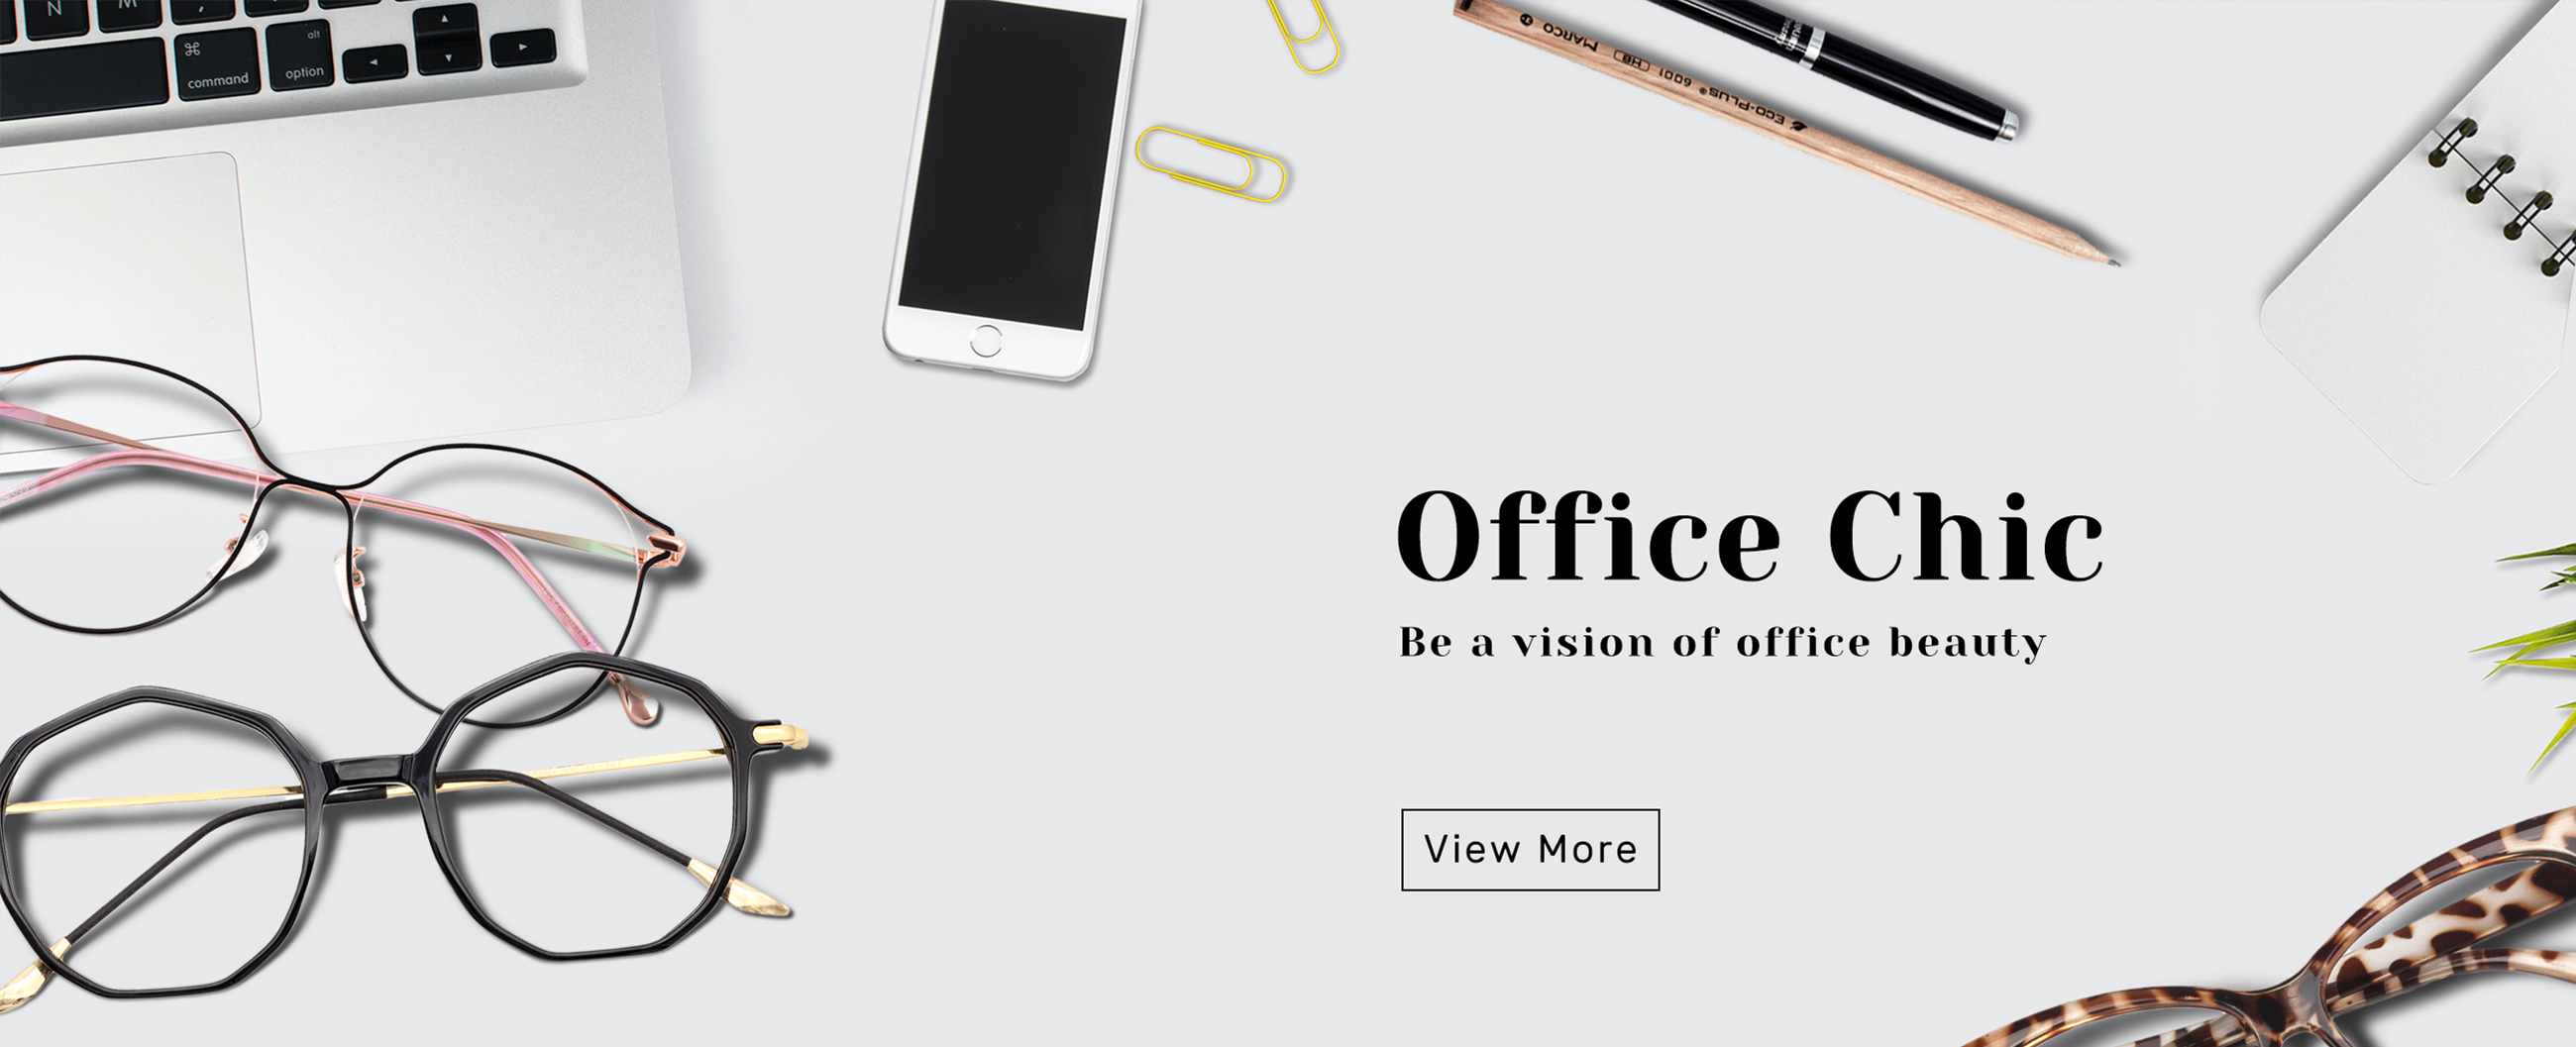 Eyeglass by office